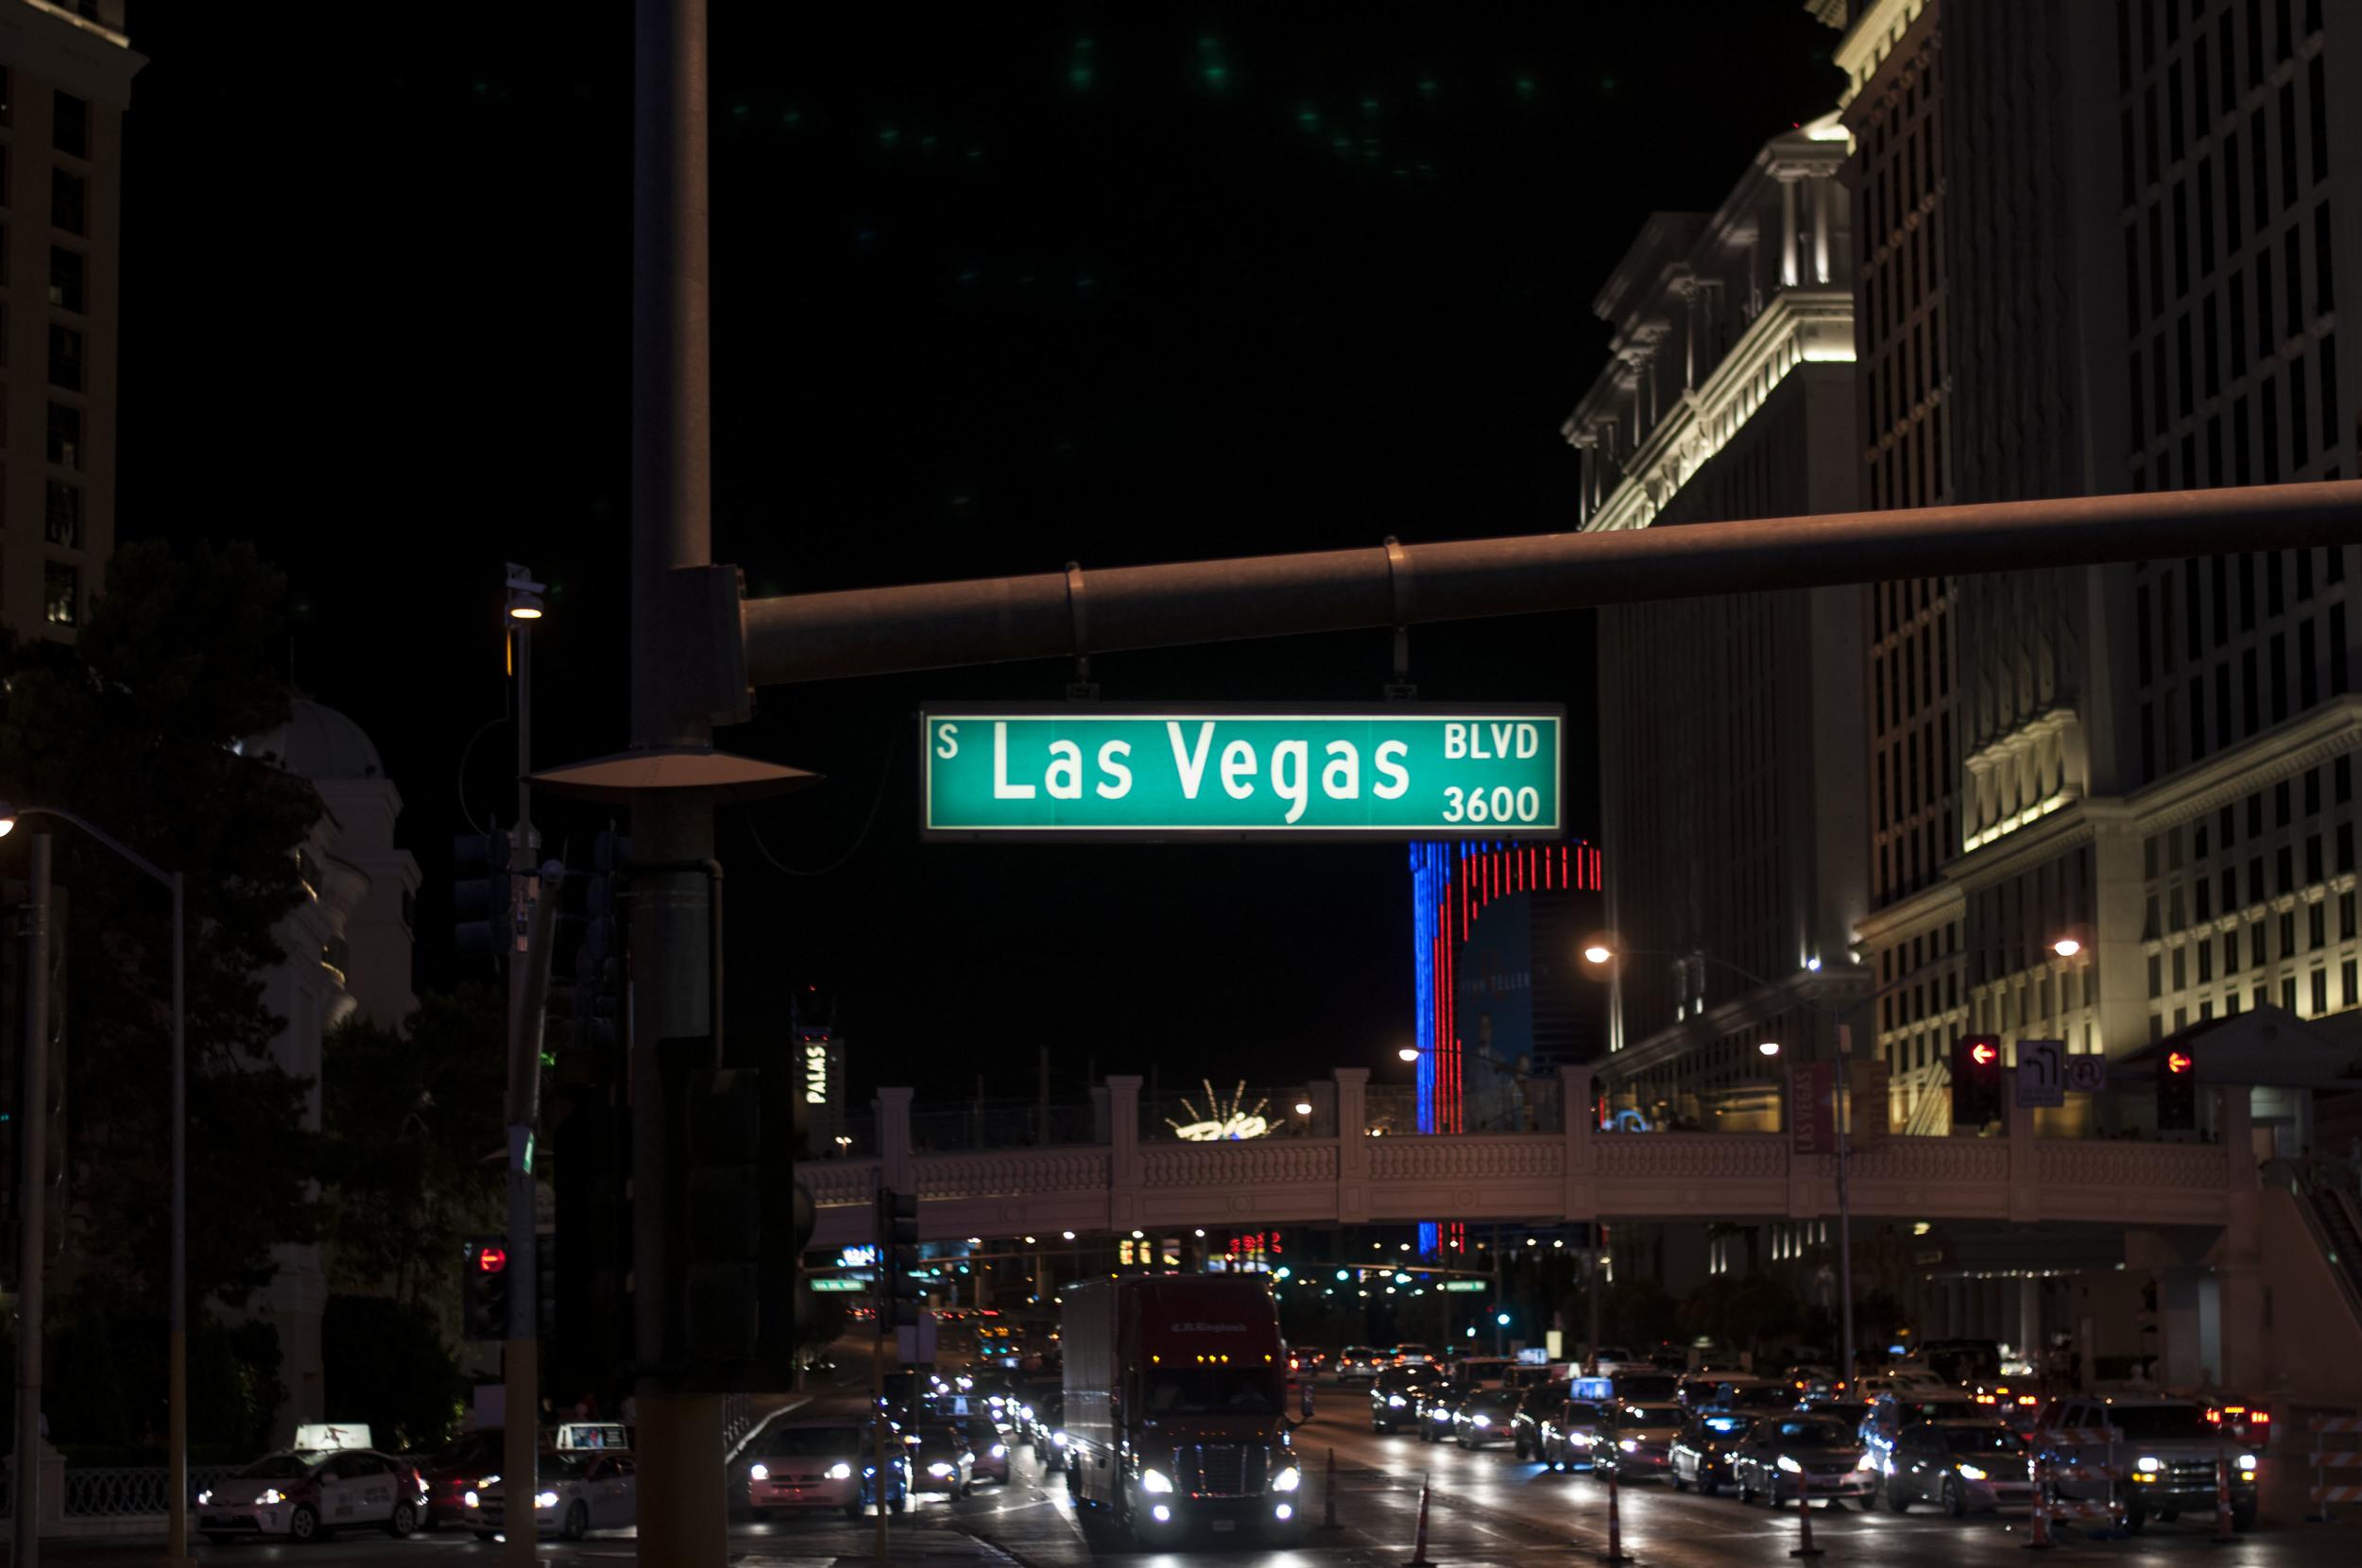 Las Vegas_162.jpg